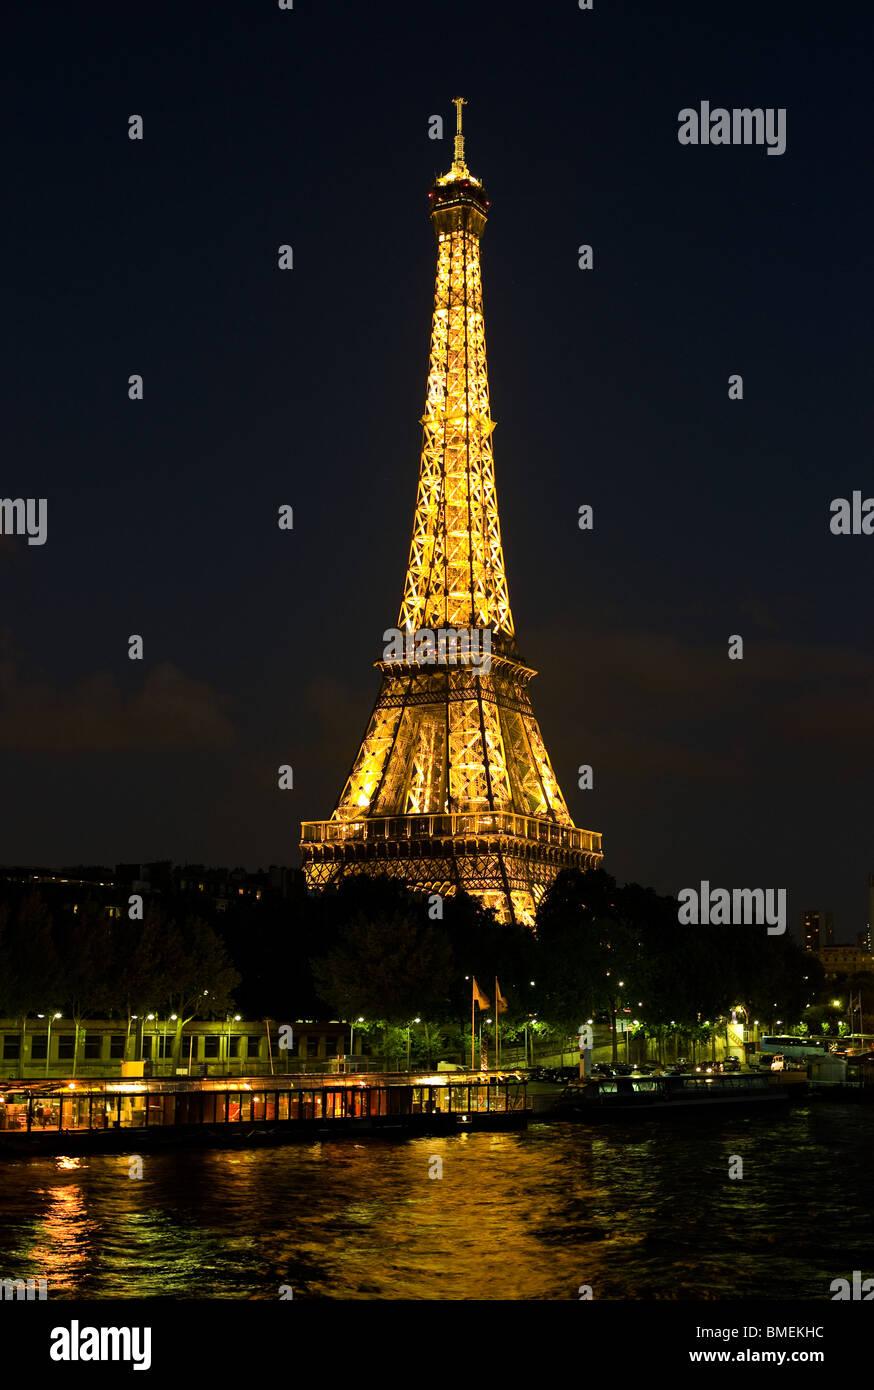 EIFFEL TOWER AT NIGHT PARIS, FRANCE Stock Photo